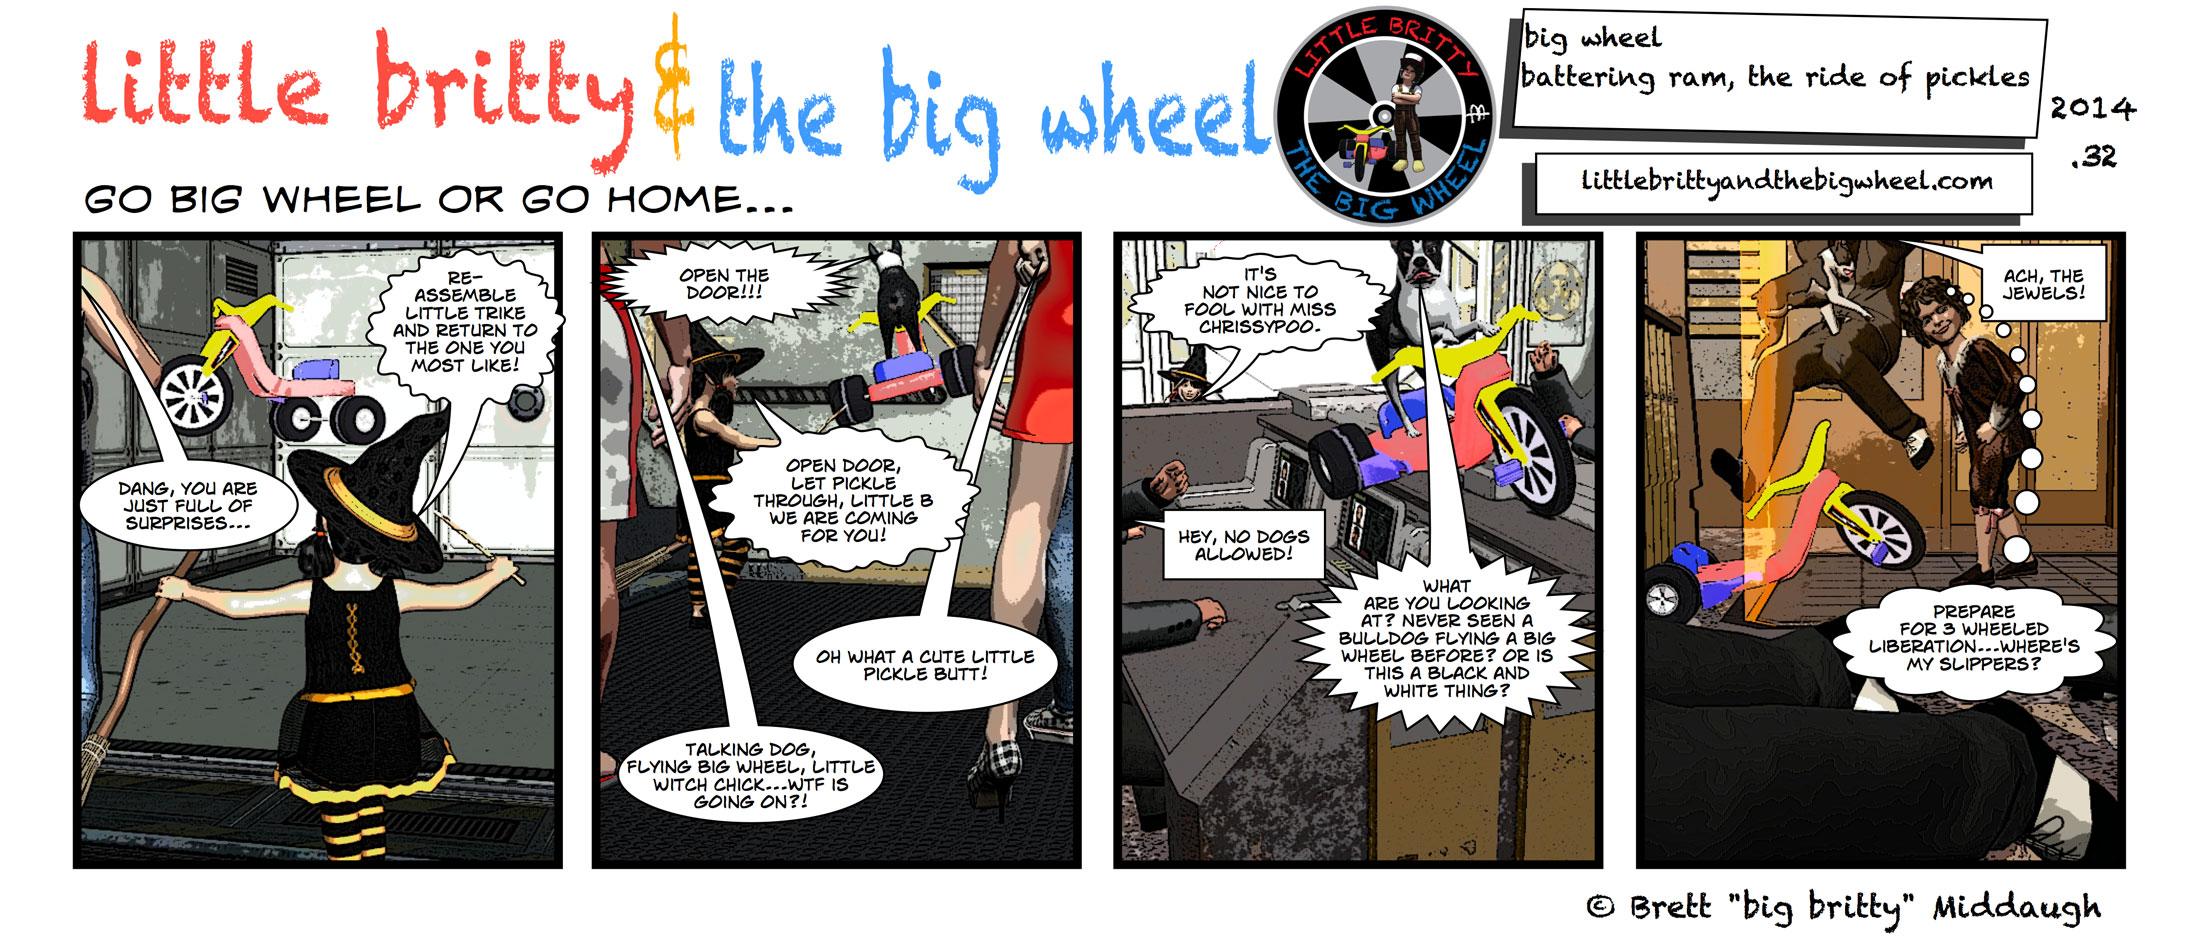 big wheel battering ram aka the ride of miss pickles #35